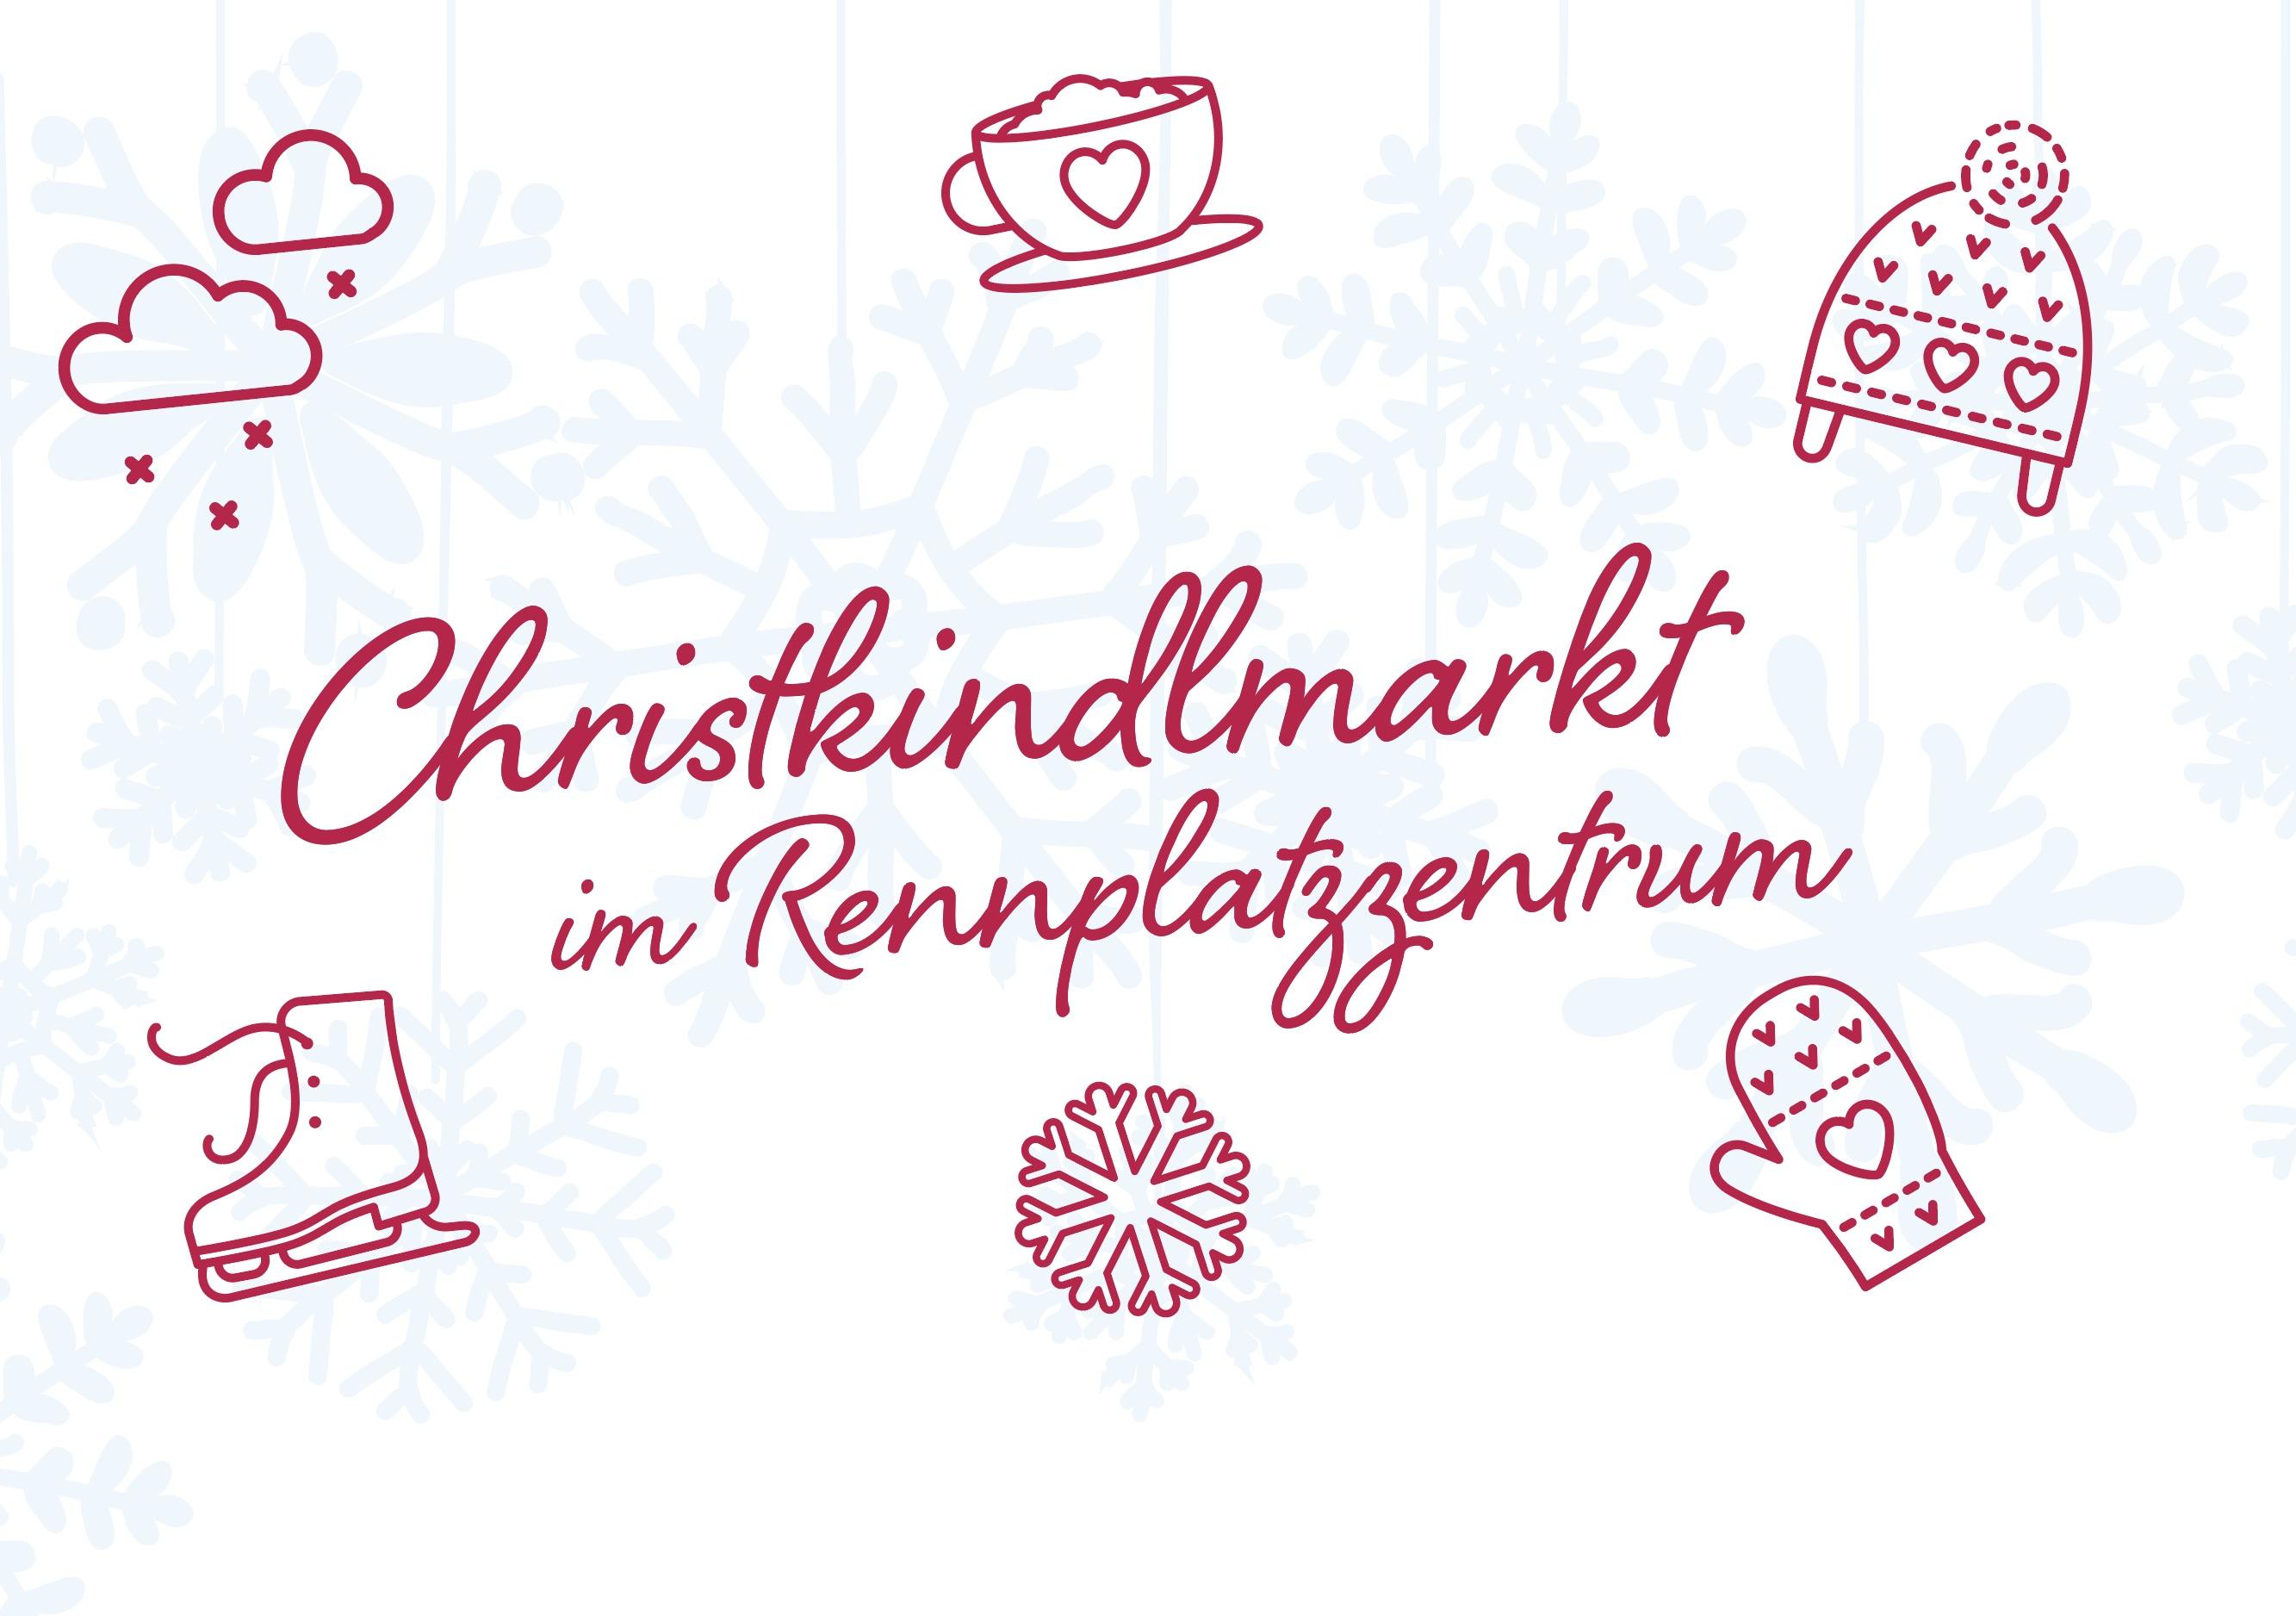 REZ-Christkindlmarkt-Regensburg